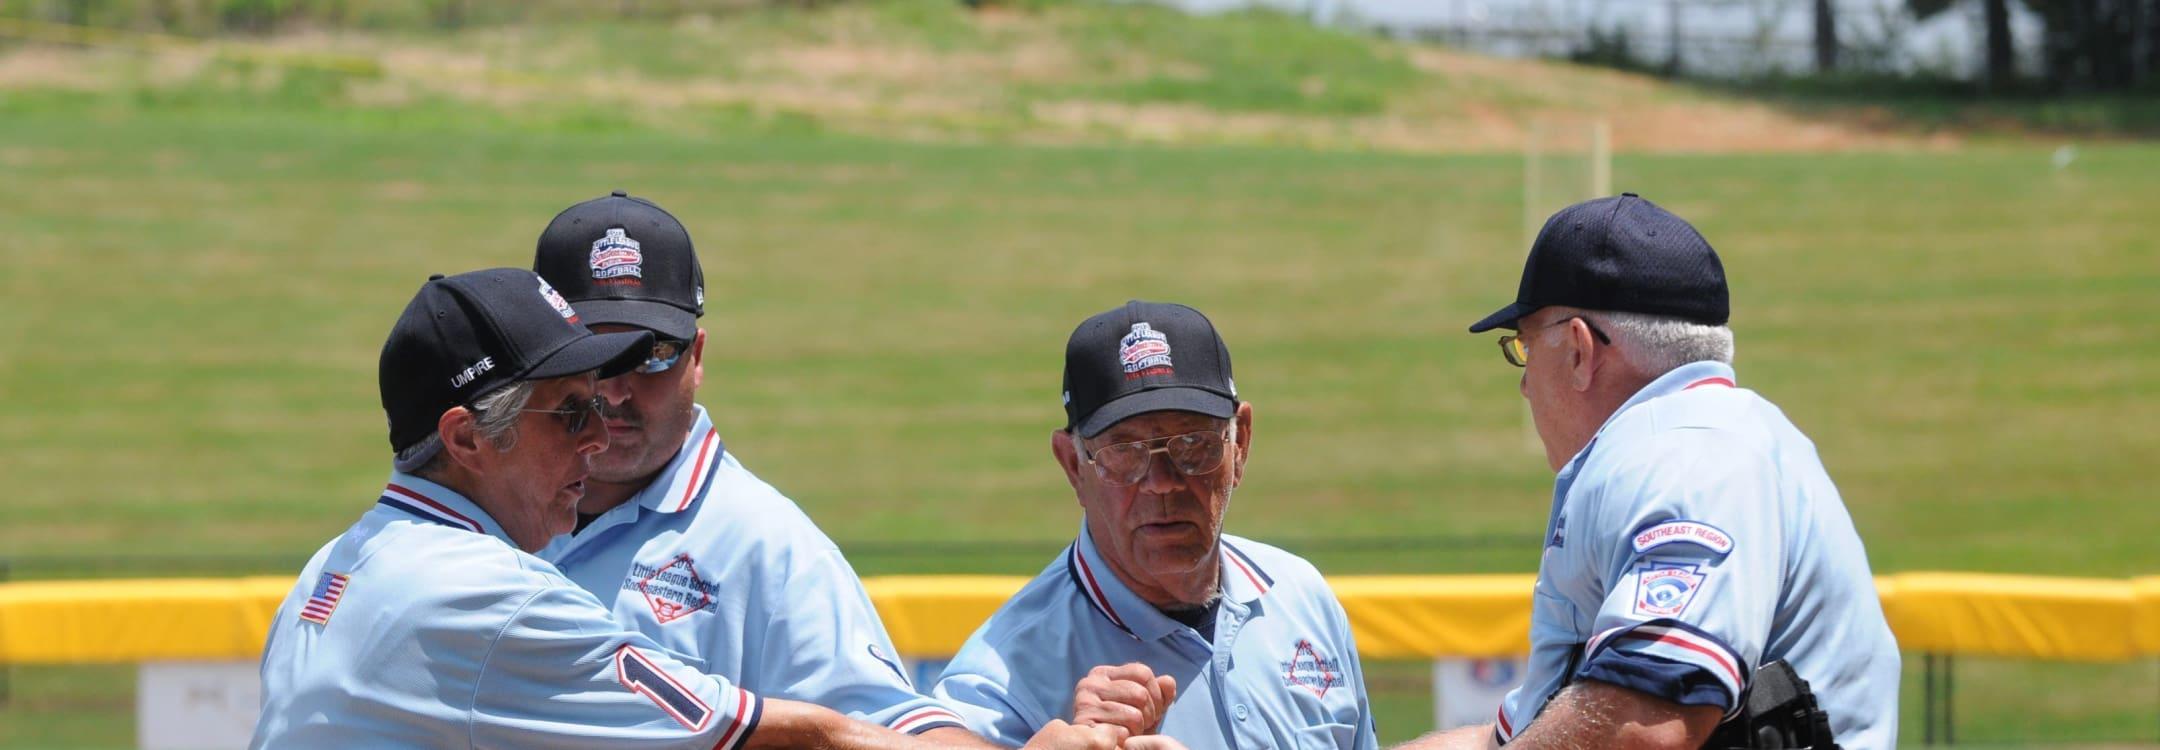 southeast region umpires